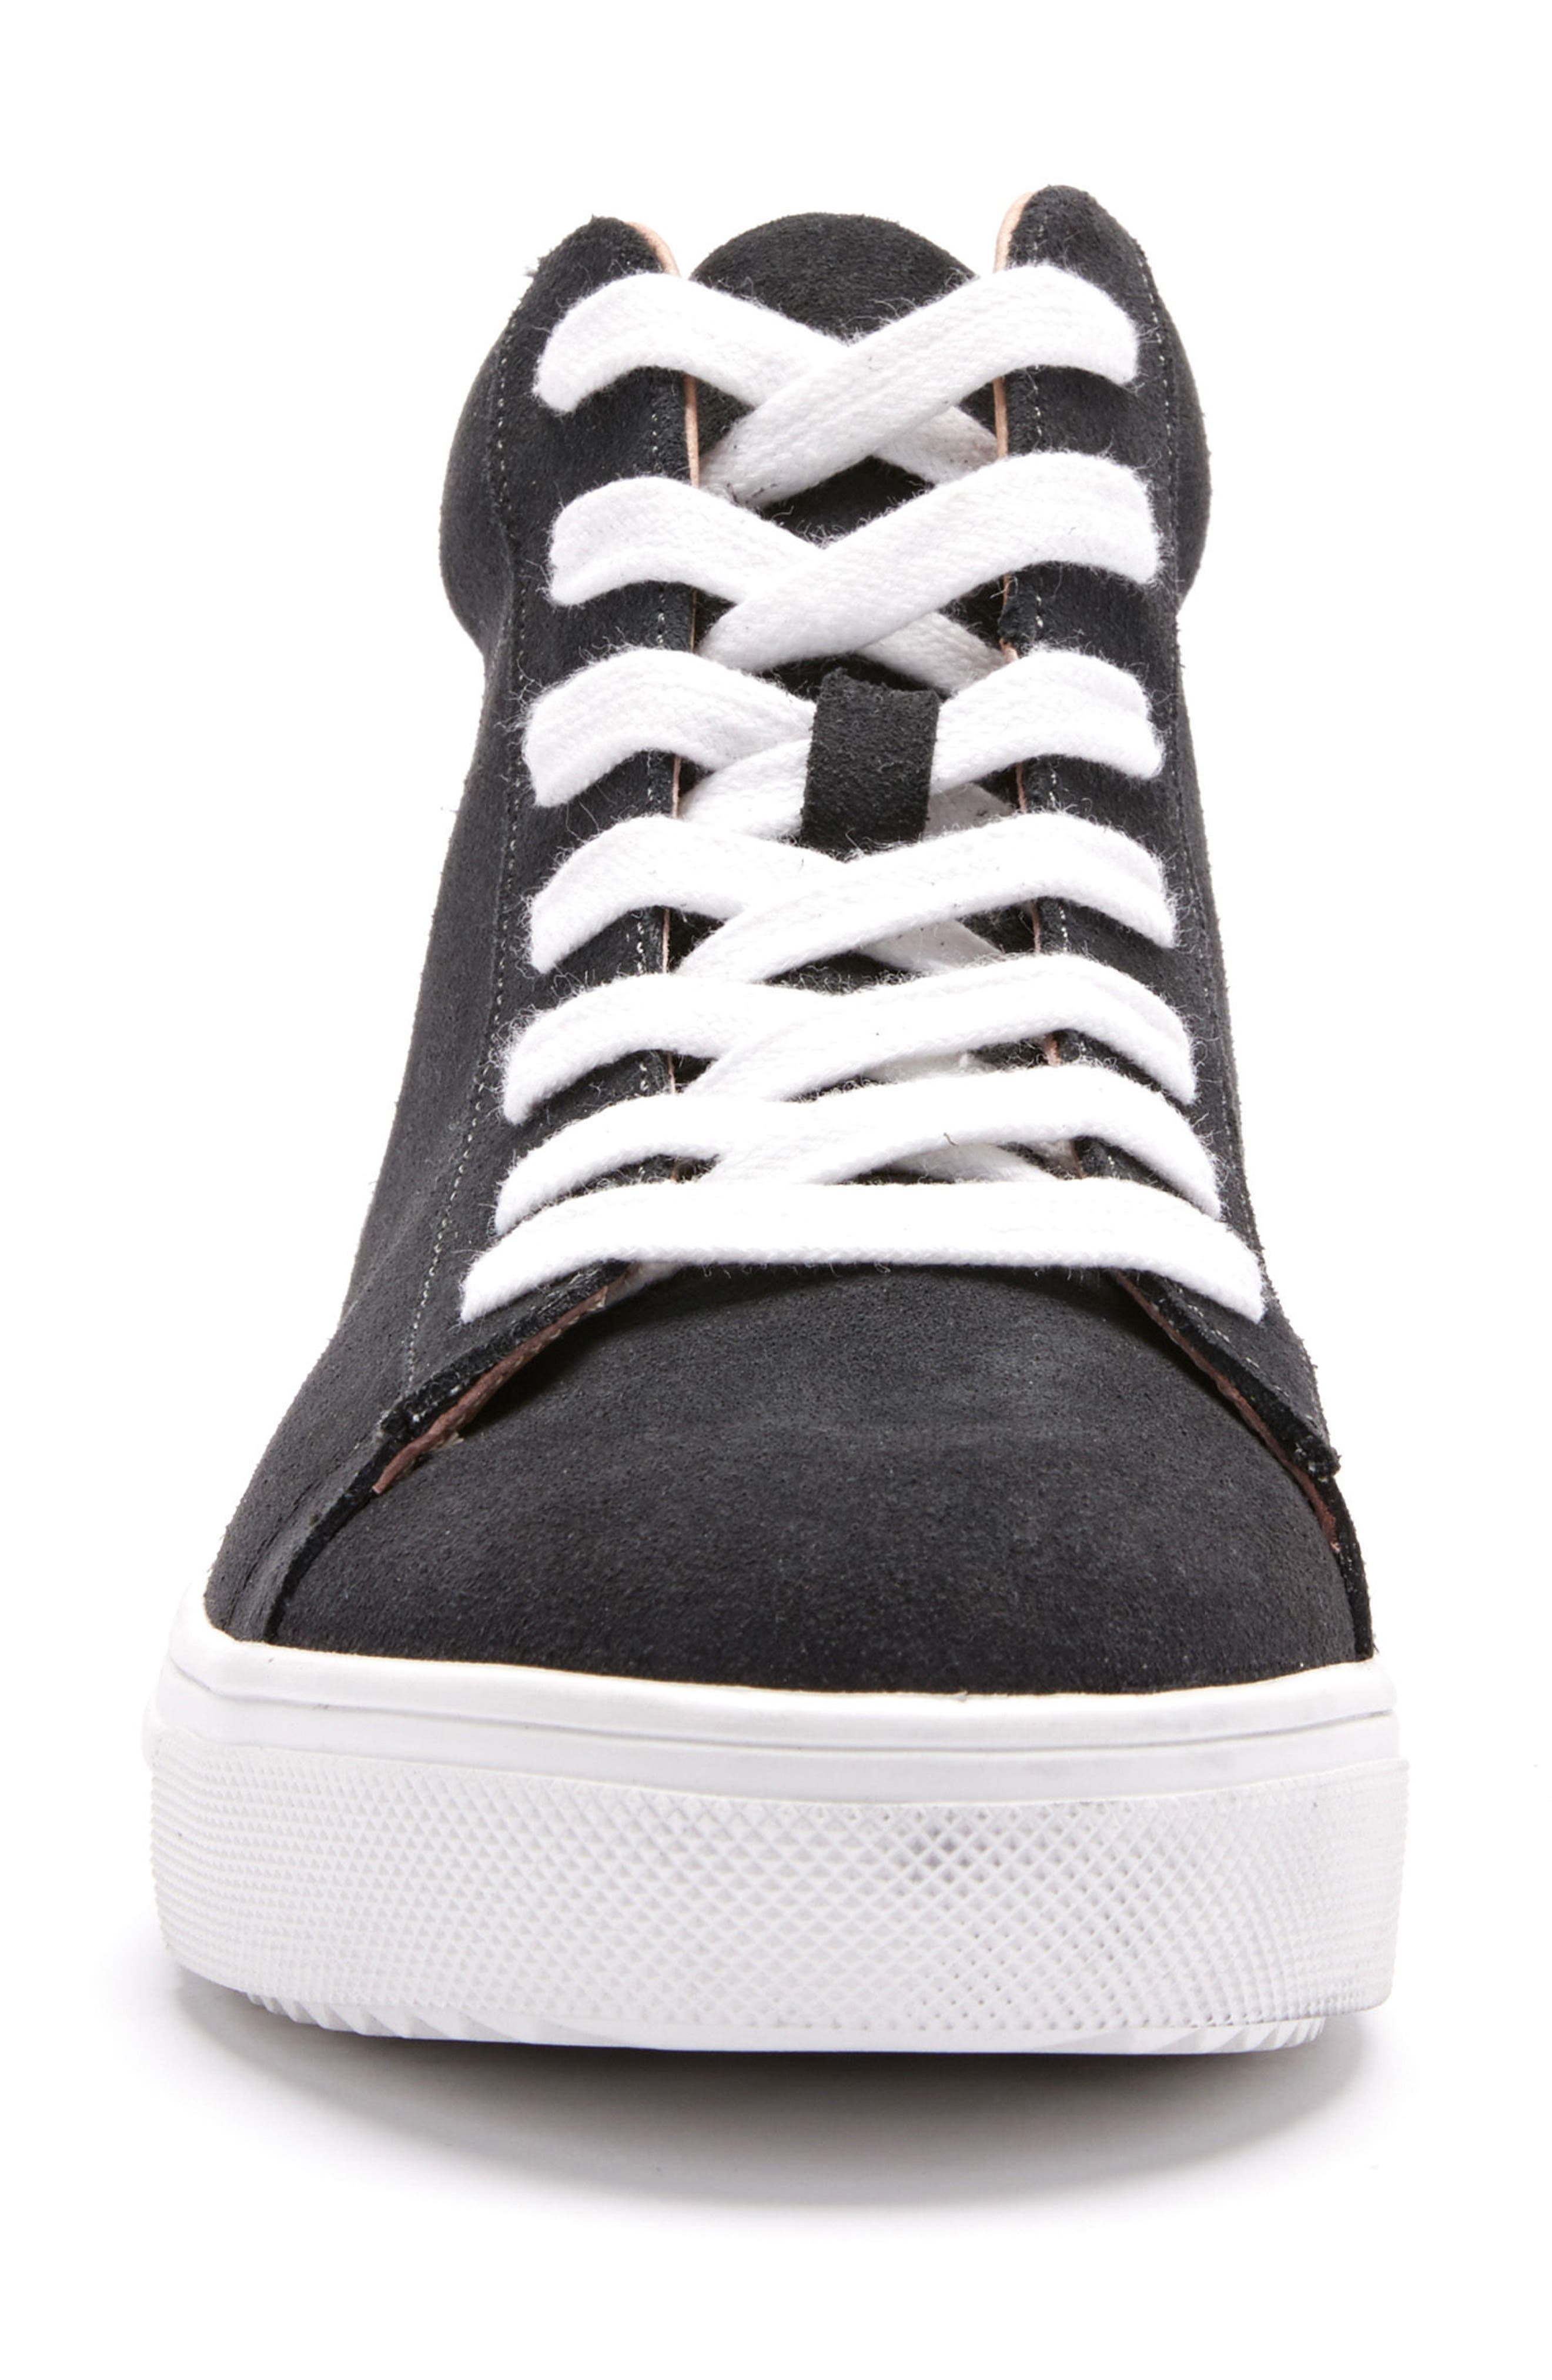 Jax Waterproof High Top Sneaker,                             Alternate thumbnail 10, color,